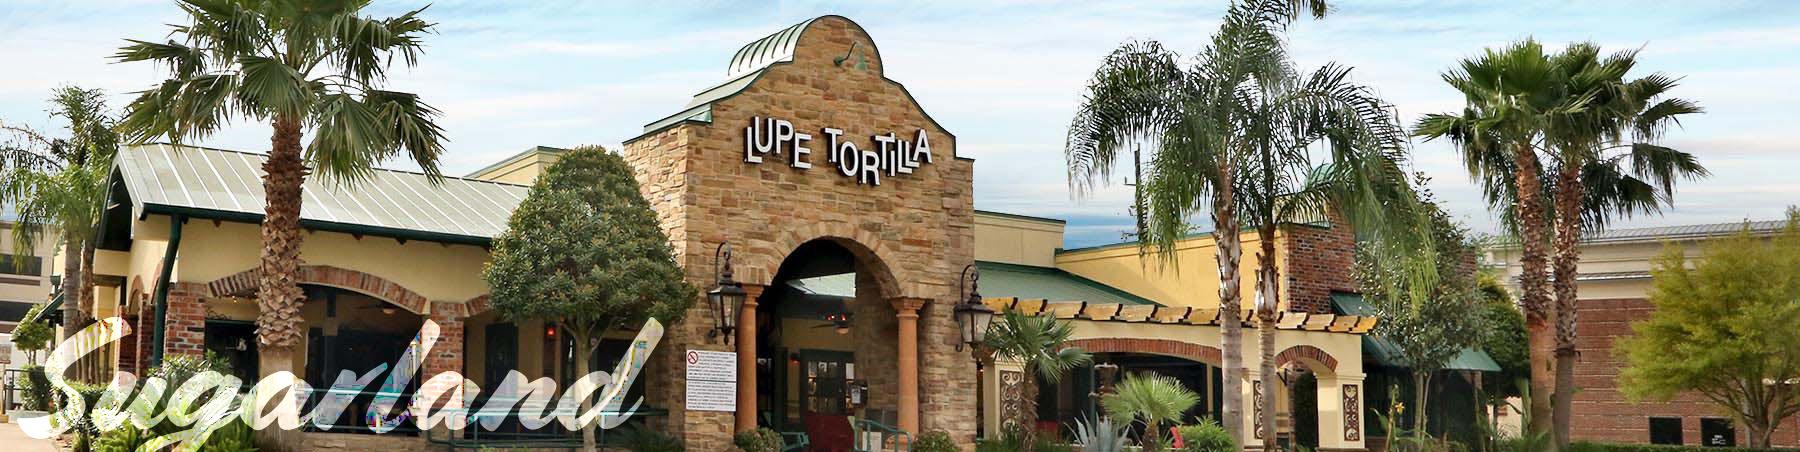 Lupe Tortilla Mexican Restaurants Sugarland